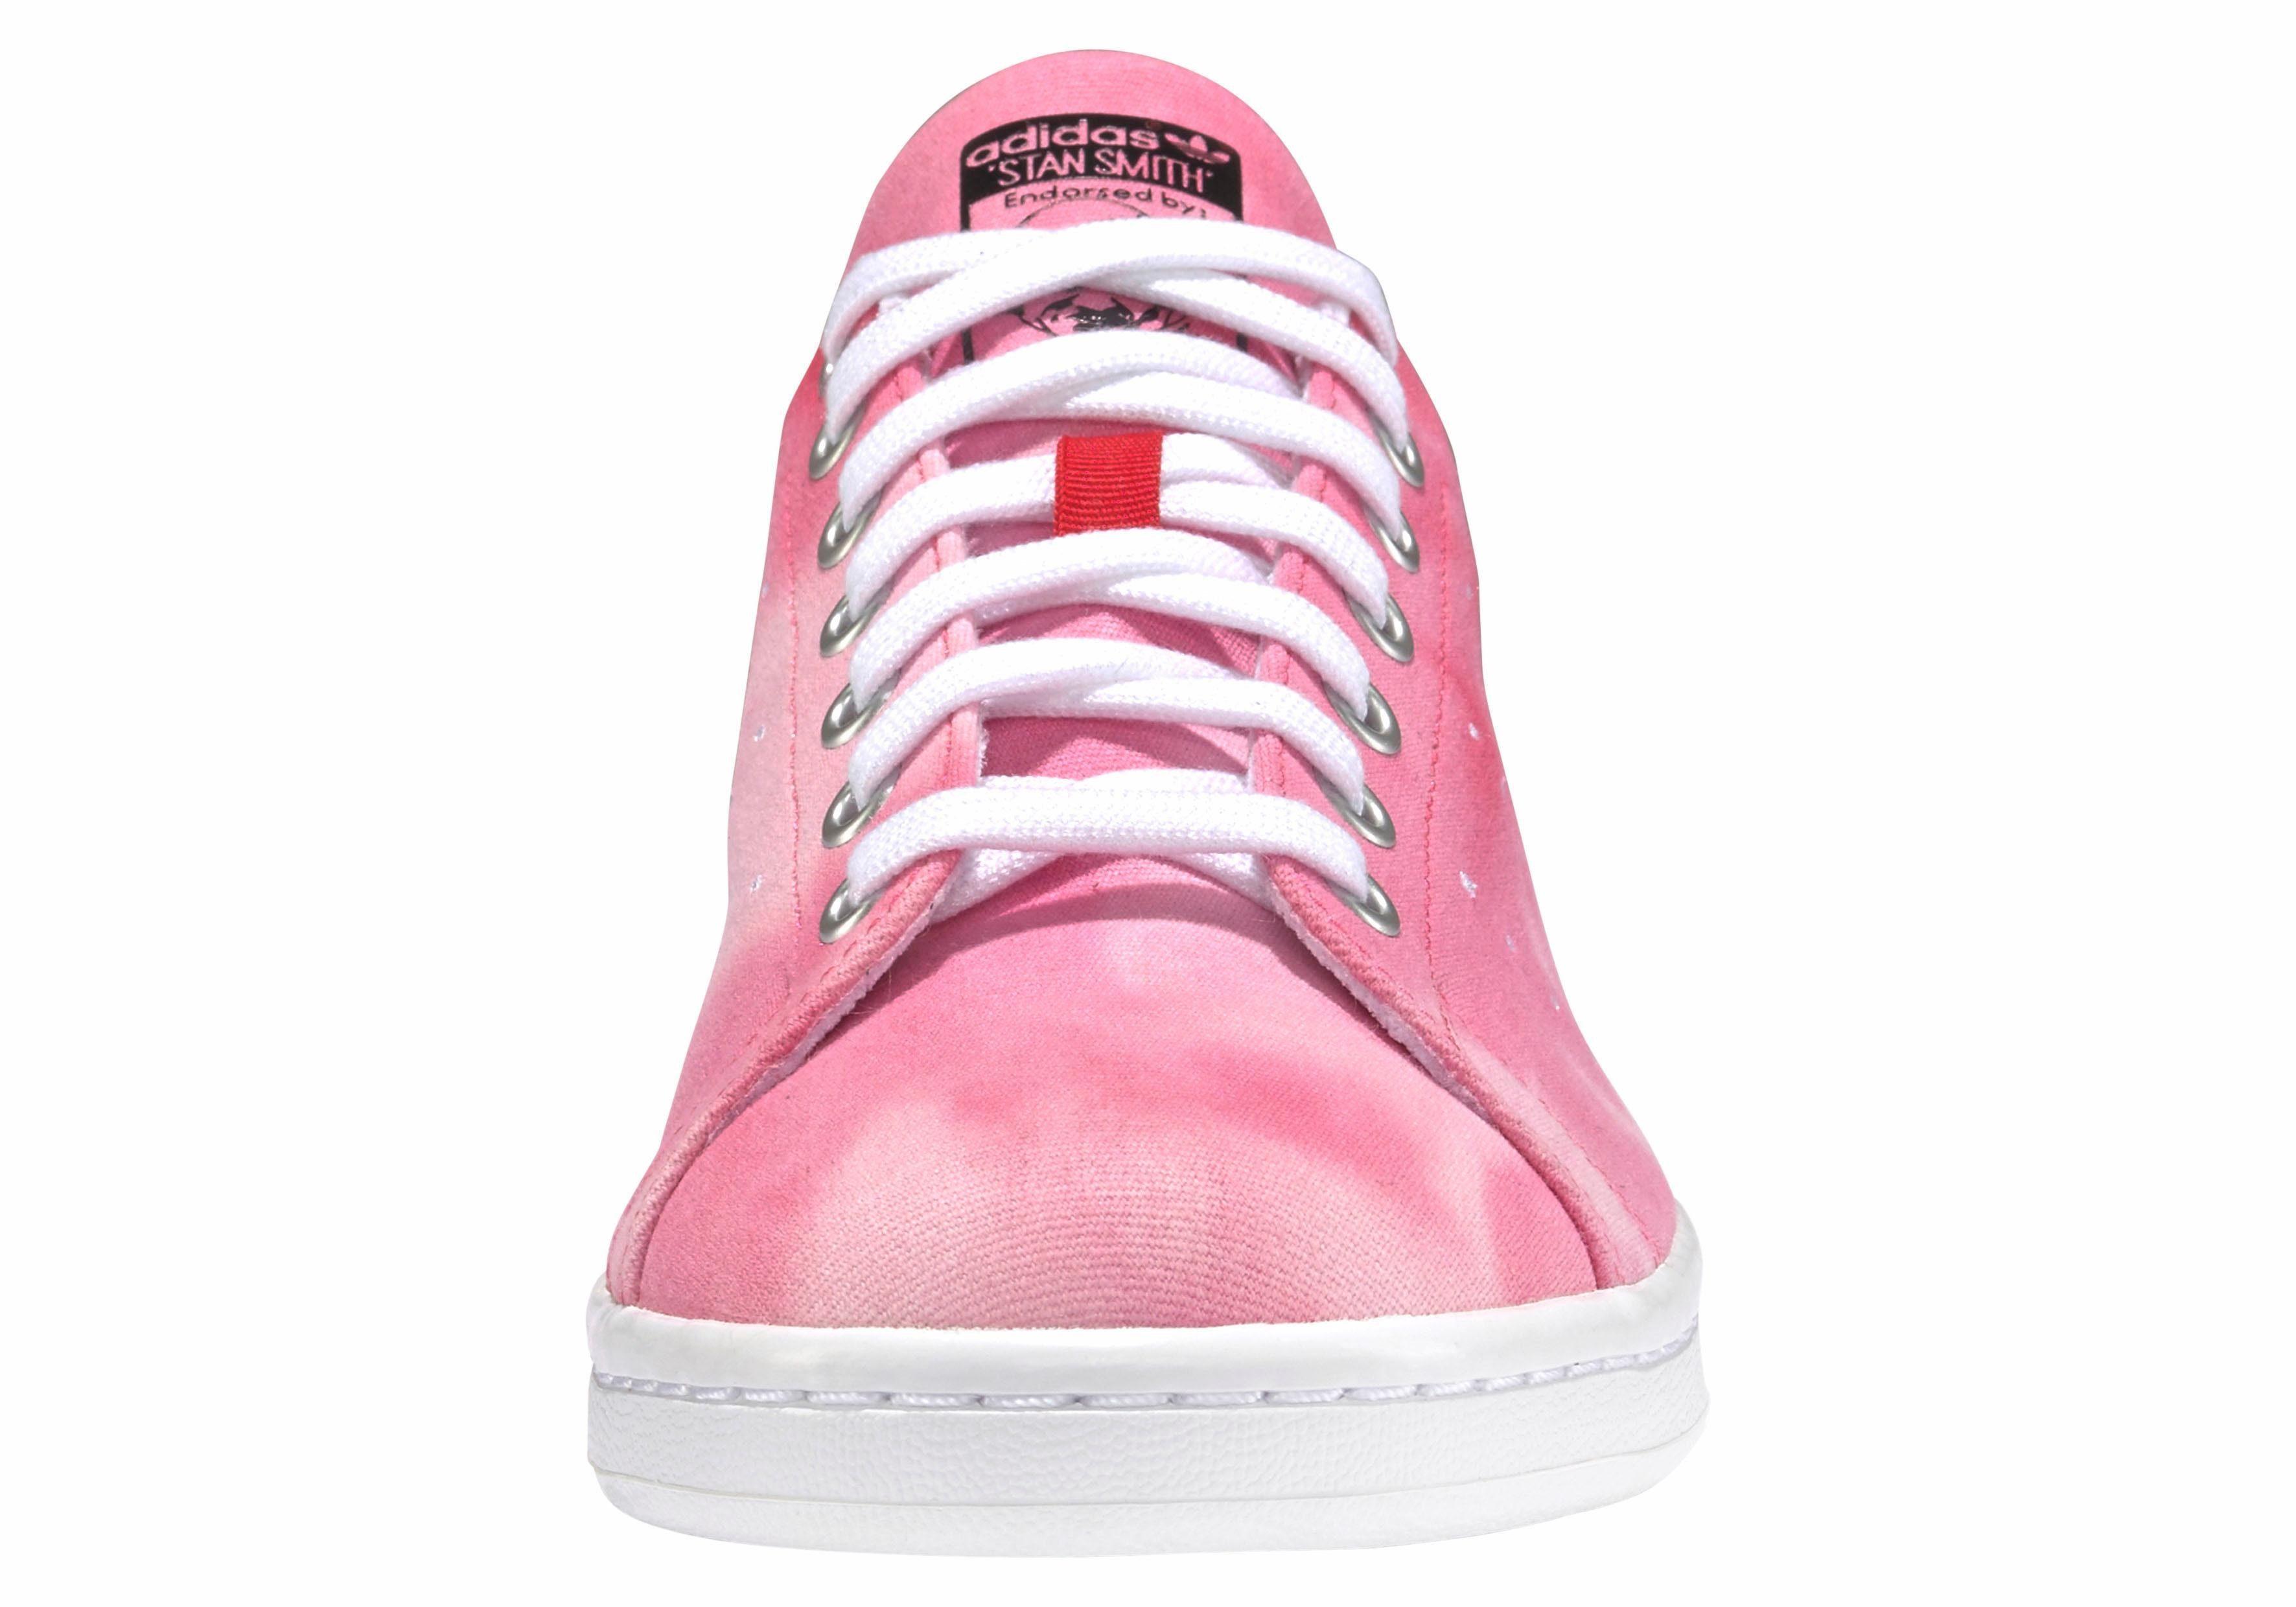 Adidas Chaussures Pw Hu Holi Baskets Stan Smith Lo Rose Rose pSidP